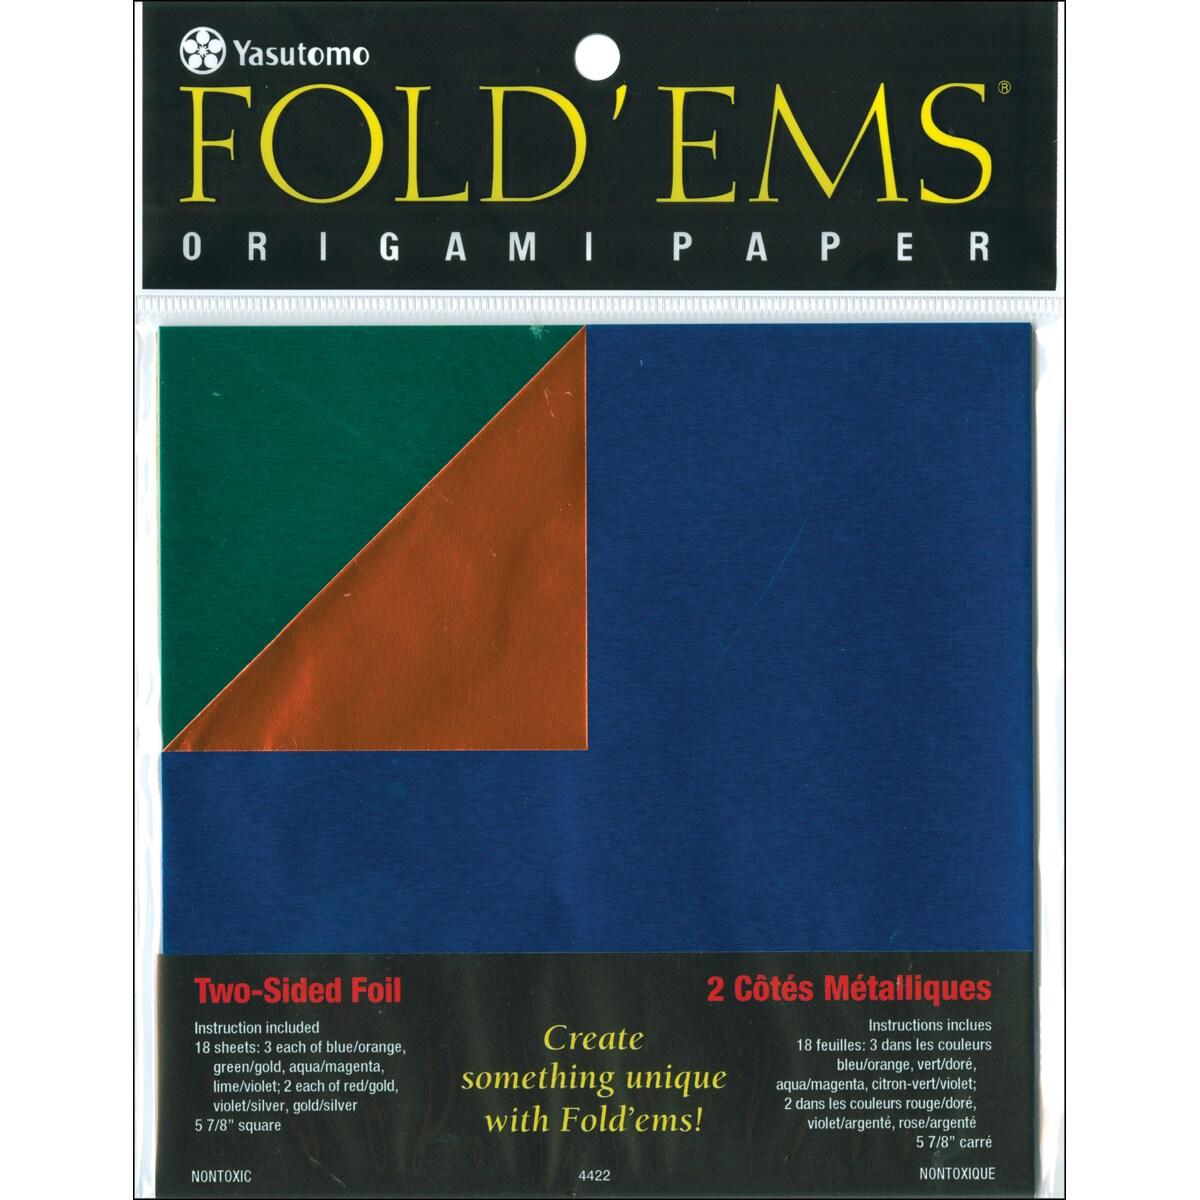 Fold 'ems Origami Double-Sided Foil Paper 18/Pkg